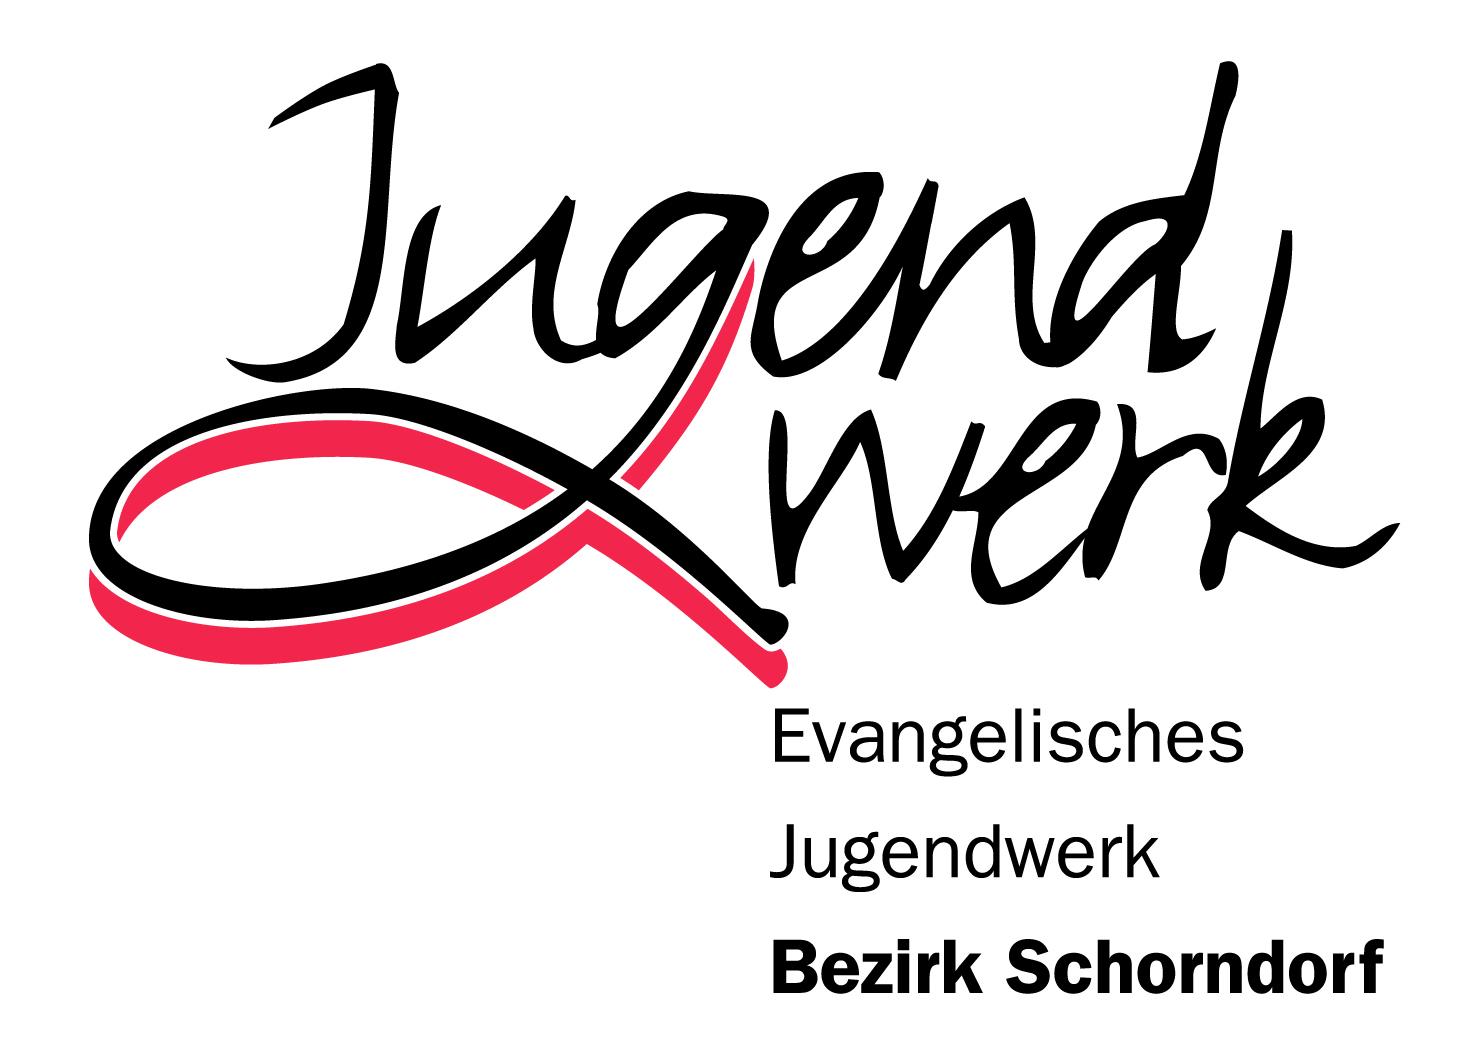 Evangelisches Jugendwerk Bezirk Schorndorf